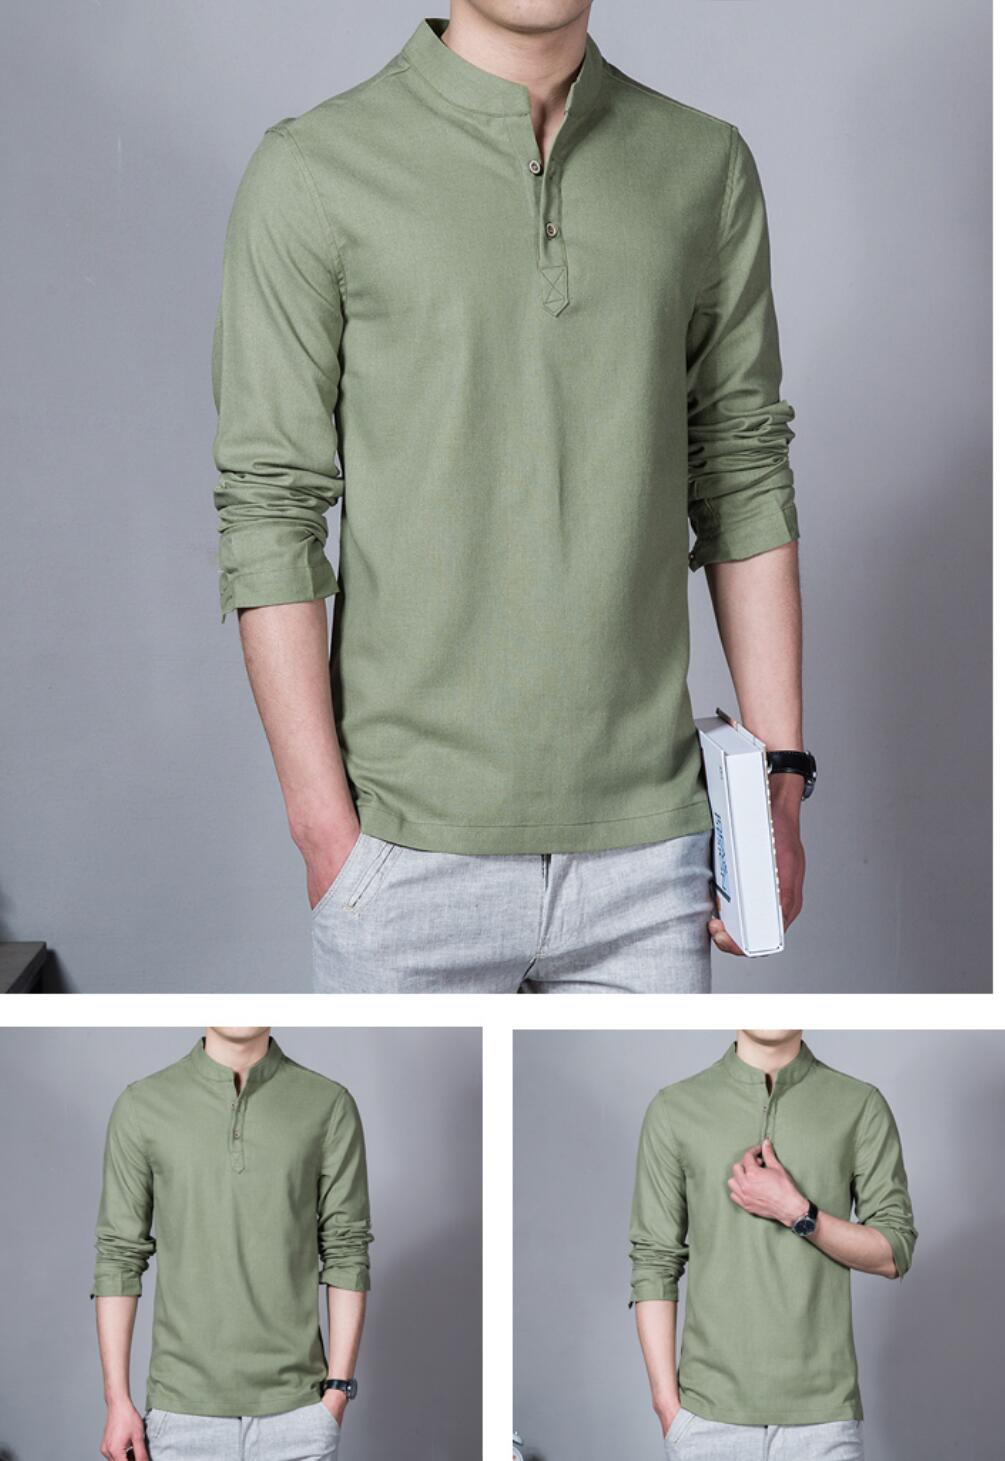 2019  NEW Men's Casual Shirt Maa1 Blue Green White Male Sleeve Slim  Shirt  PPJ11-1-23